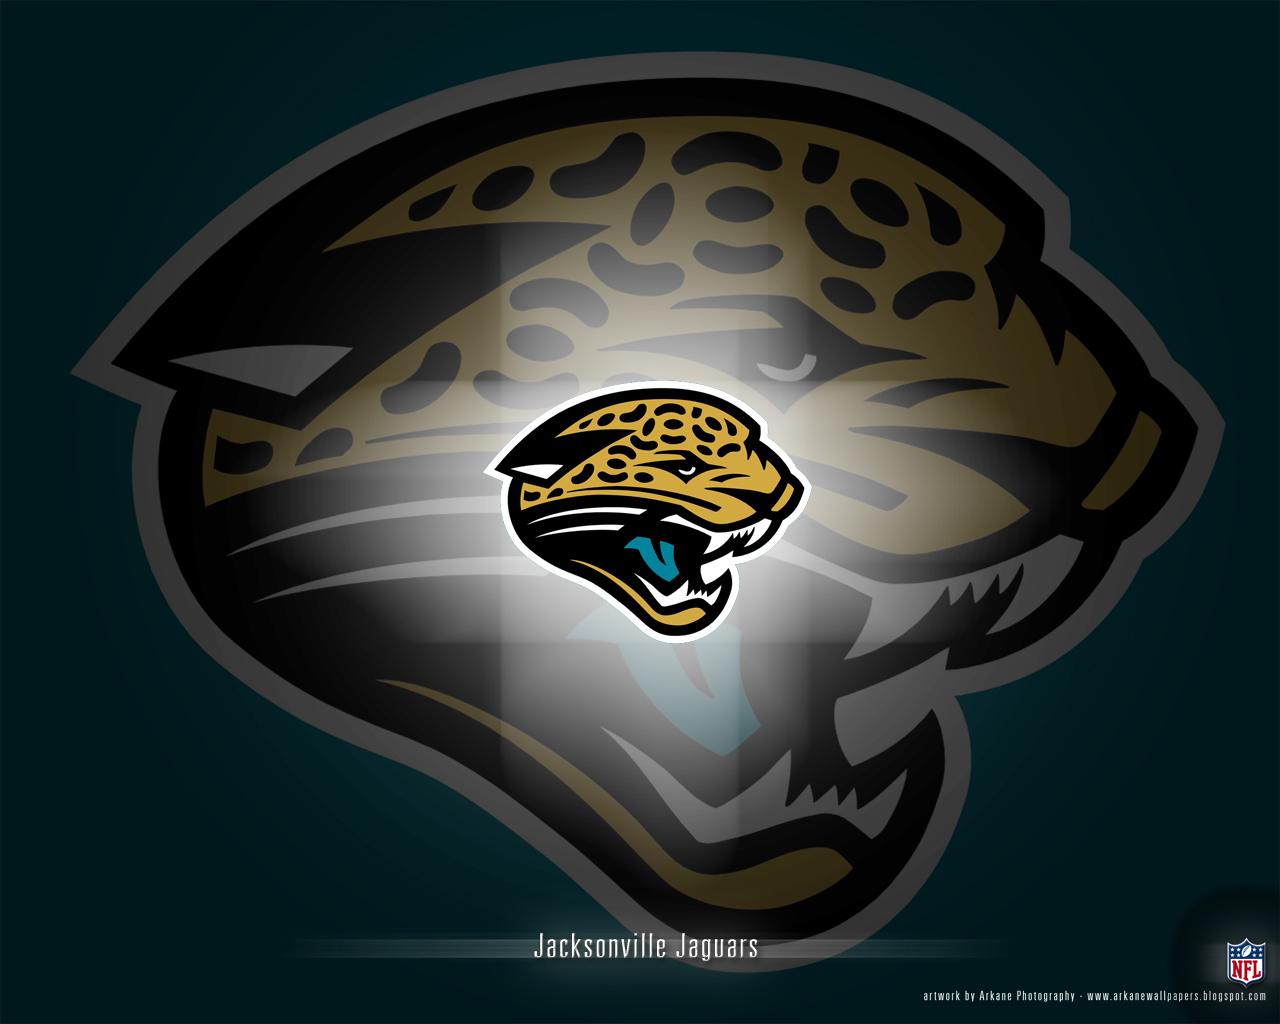 Arkane NFL Wallpapers Jacksonville Jaguars   Vol 1 1280x1024